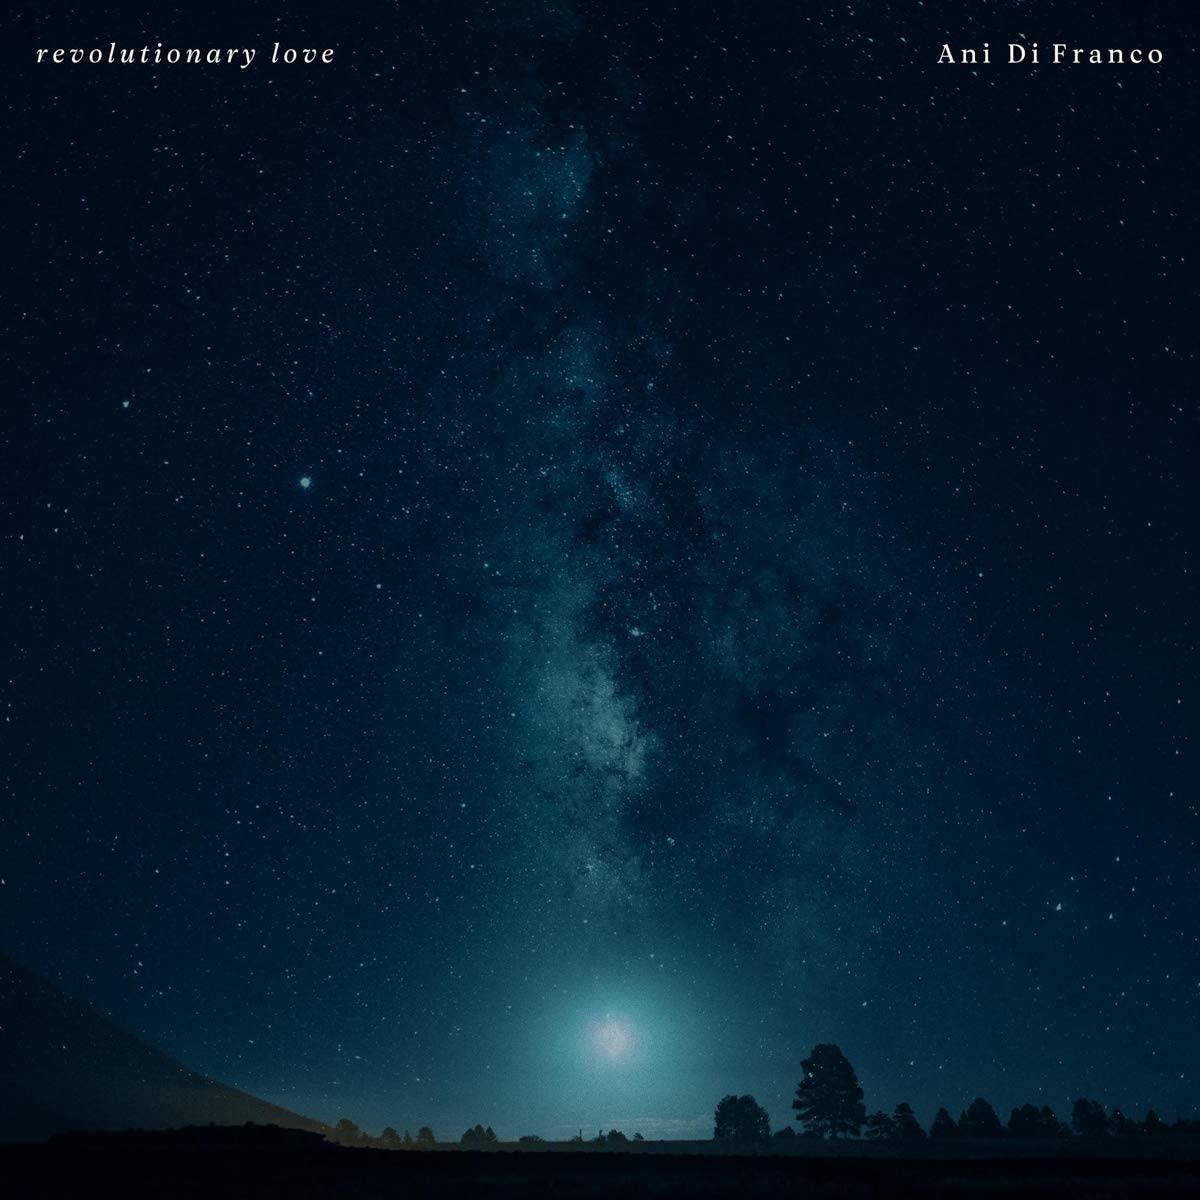 REVOLUTIONARY LOVE- ANI DIFRANCO (CD)